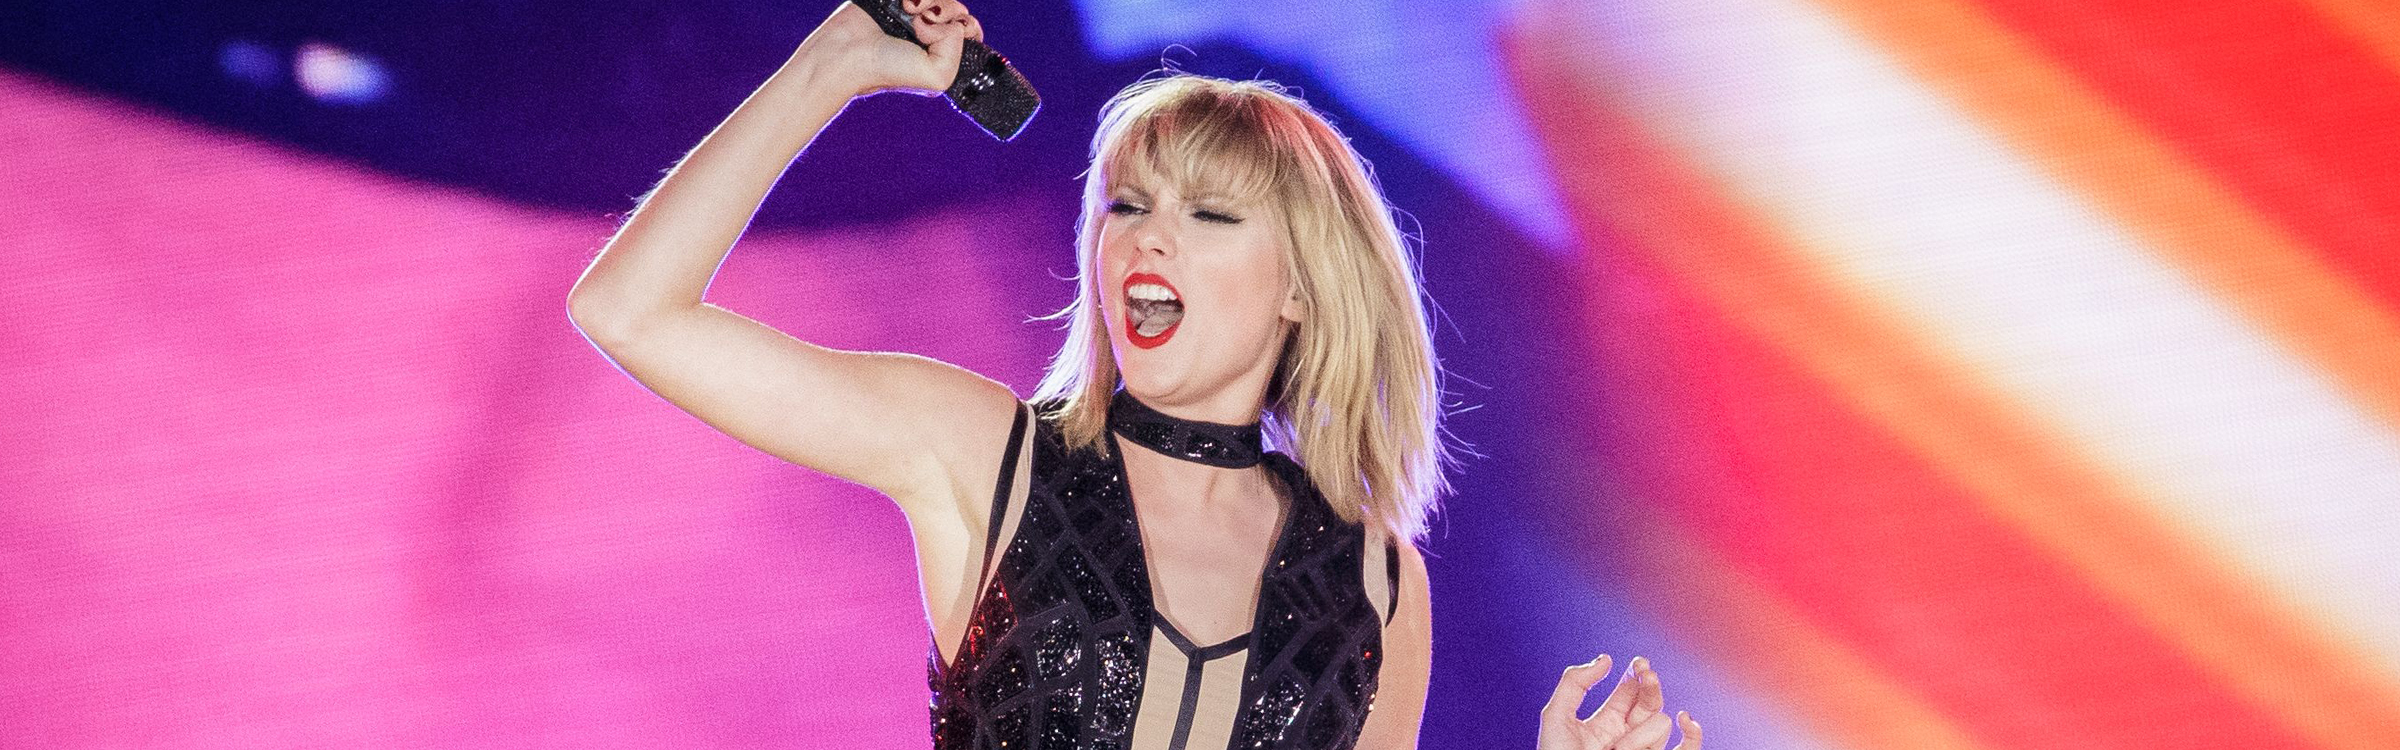 Taylor spotify header